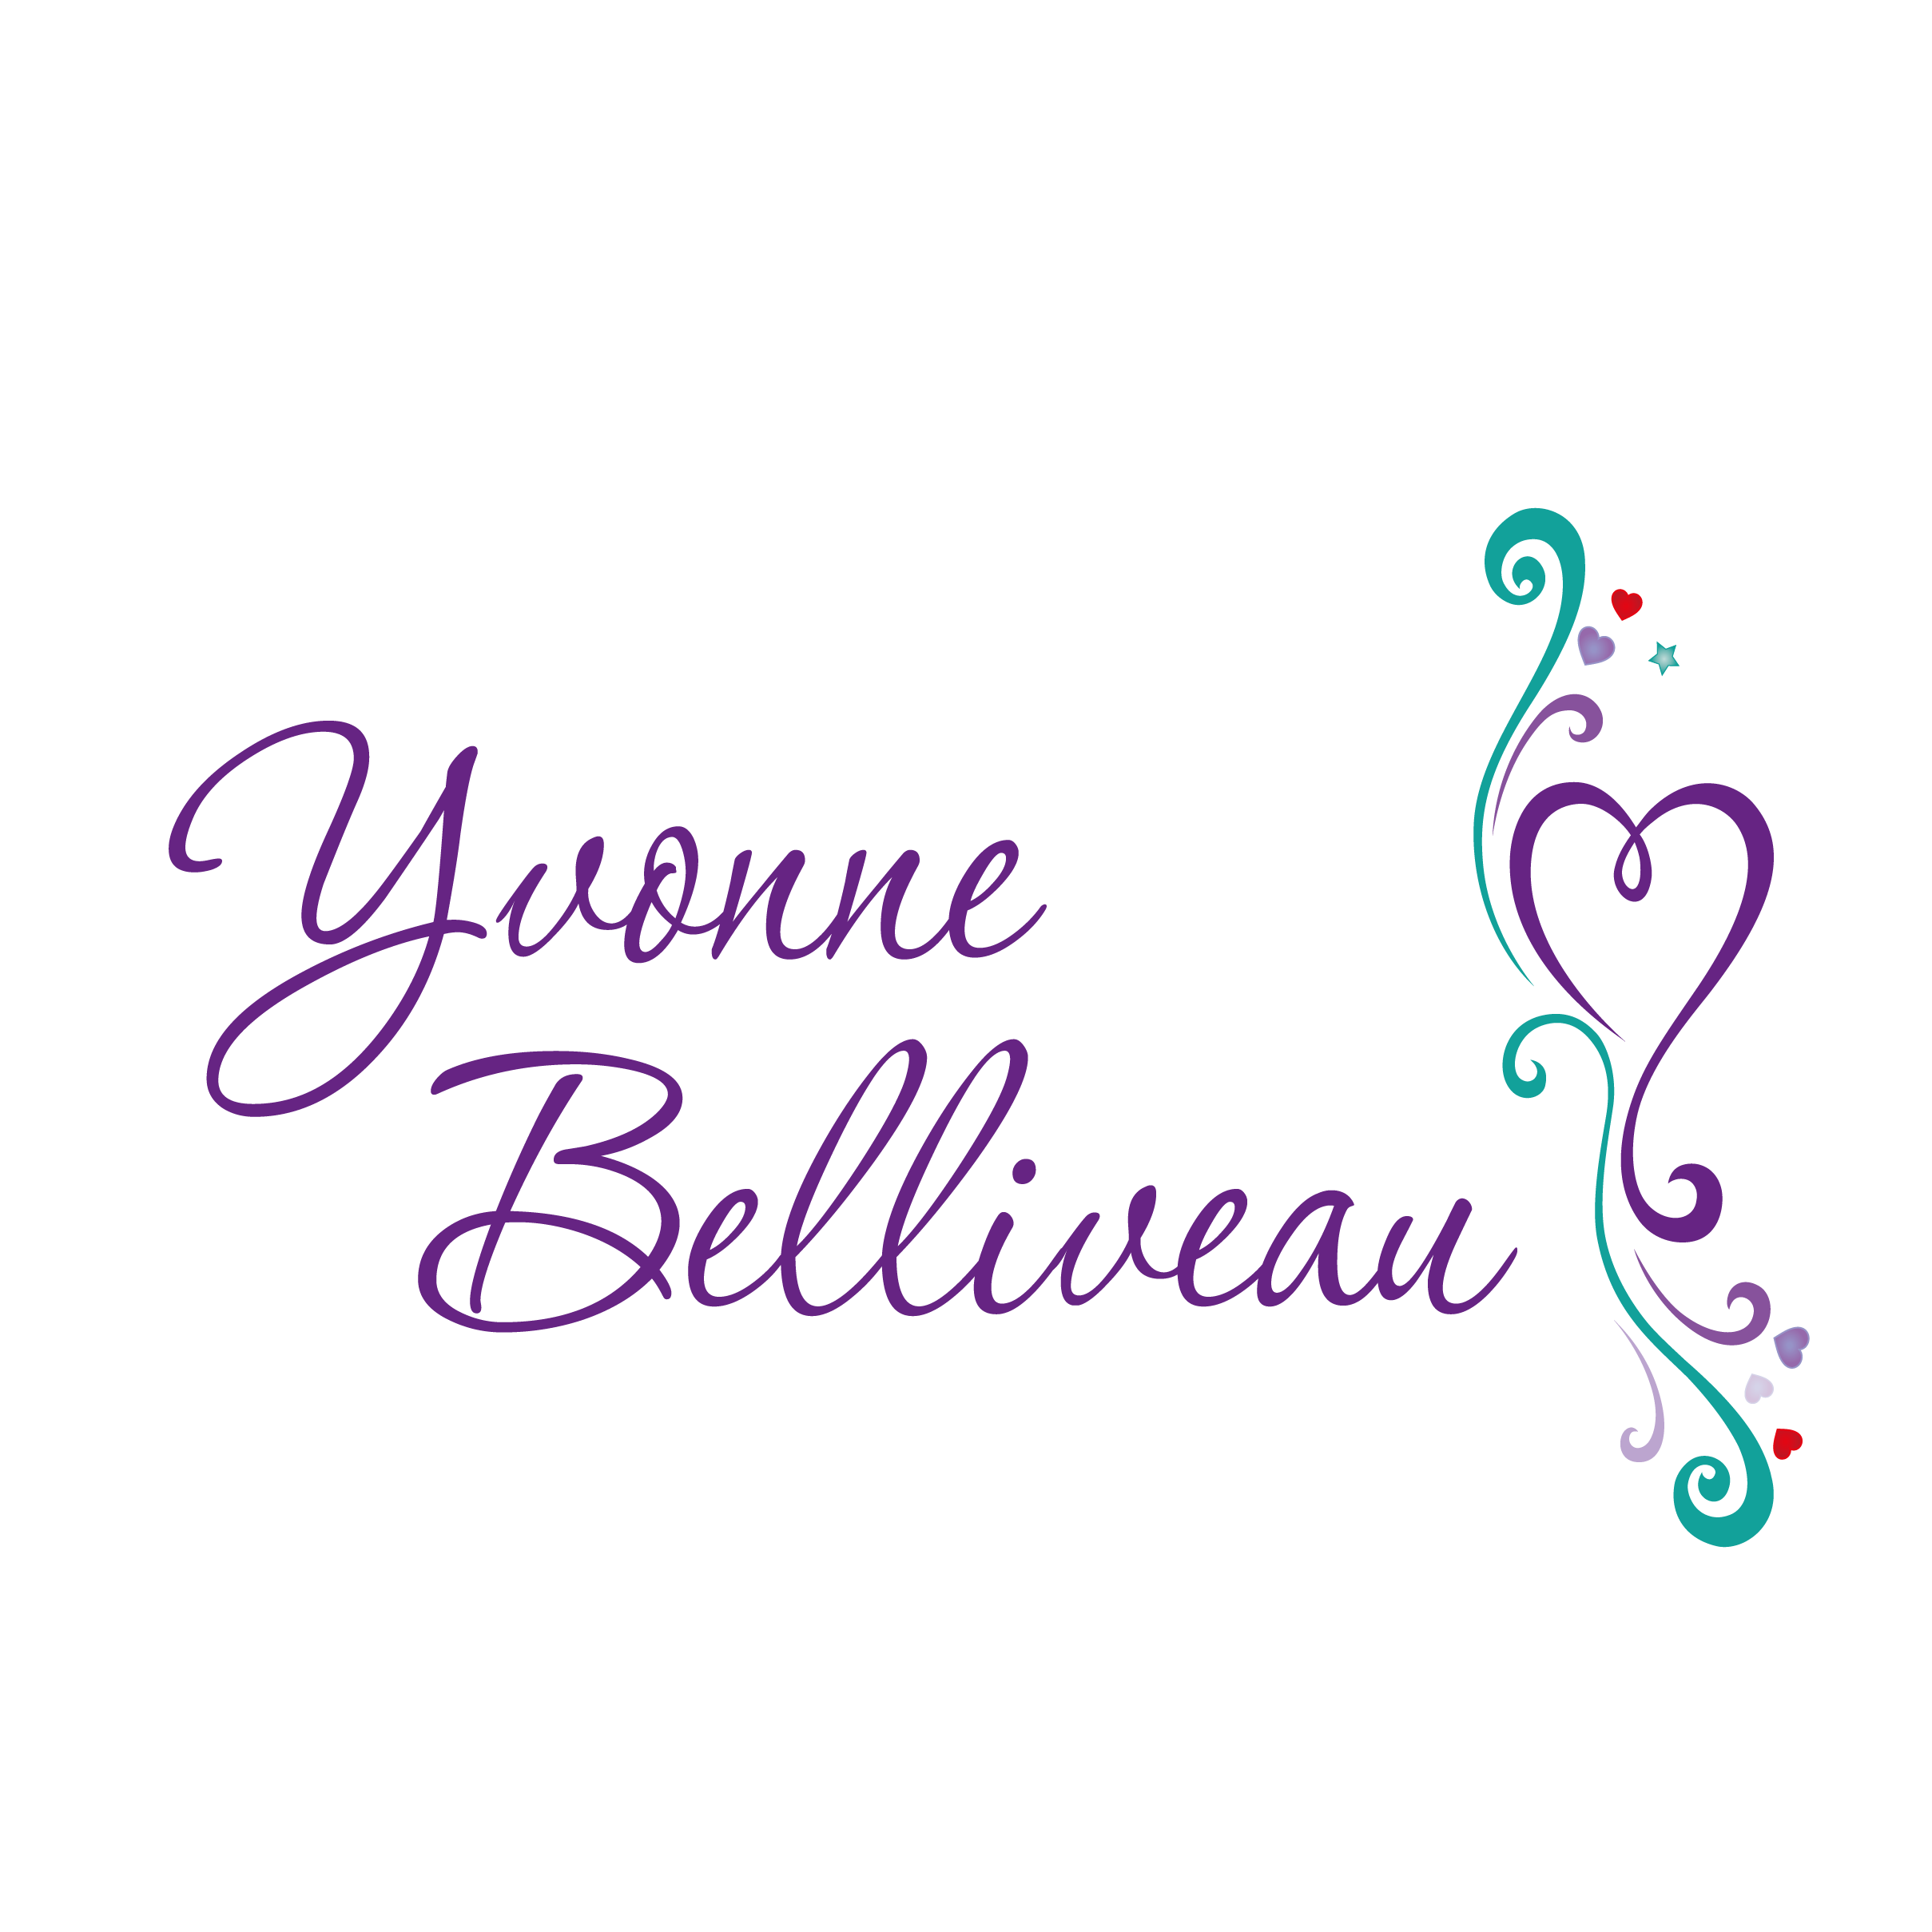 Yvonne Belliveau